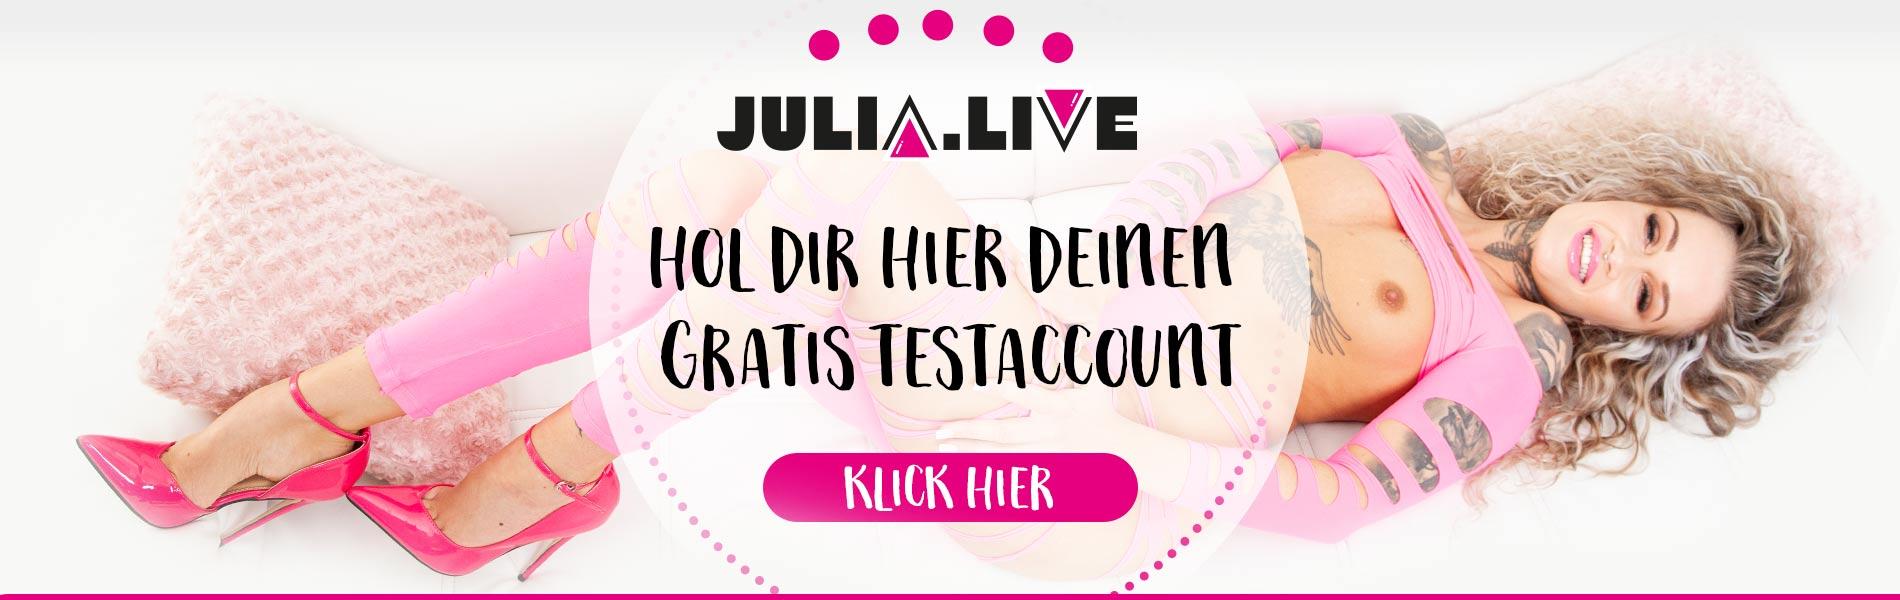 Julia Live